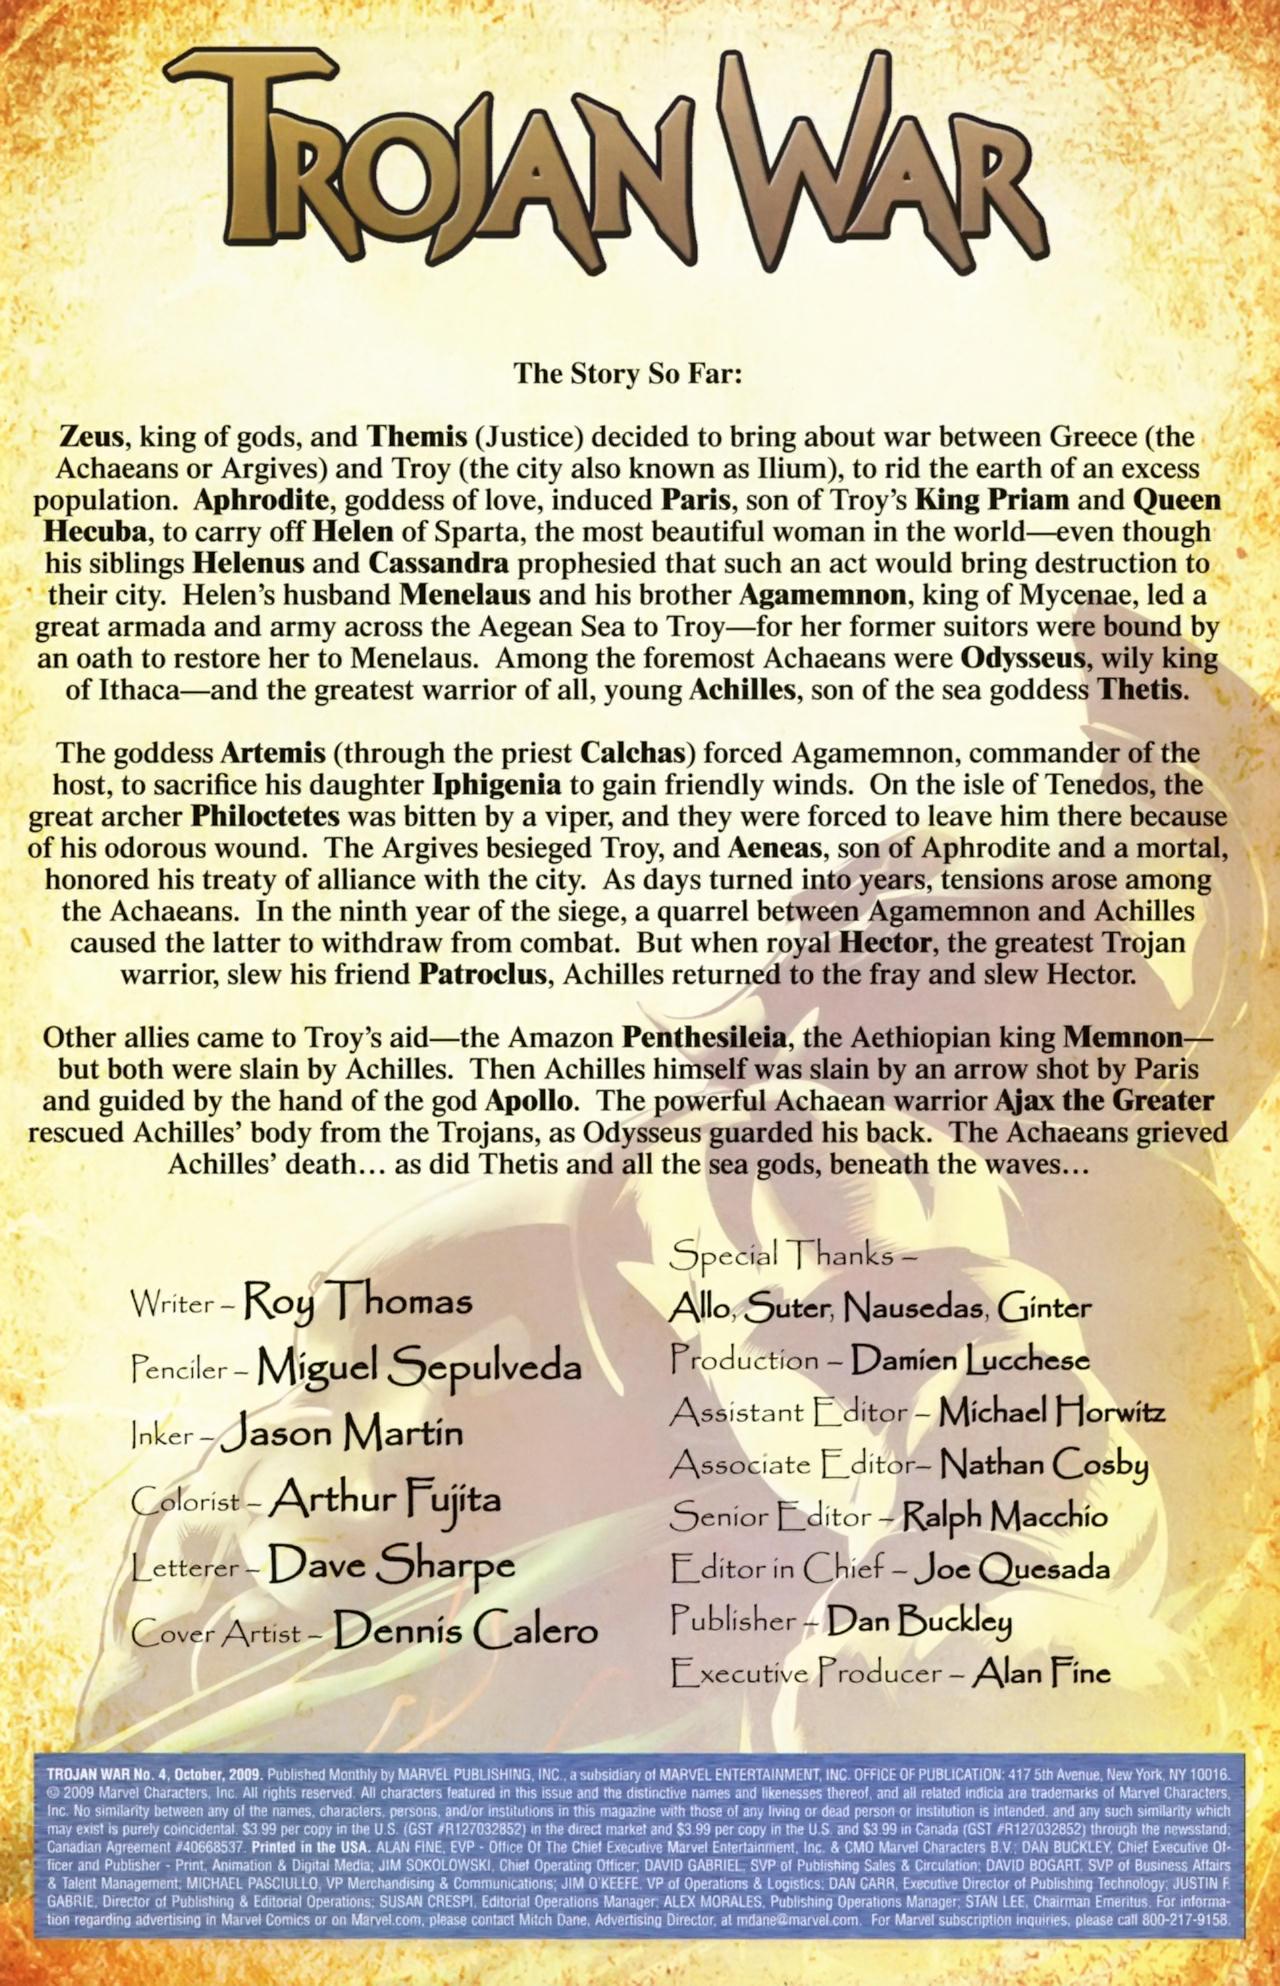 Read online Trojan War comic -  Issue #4 - 3